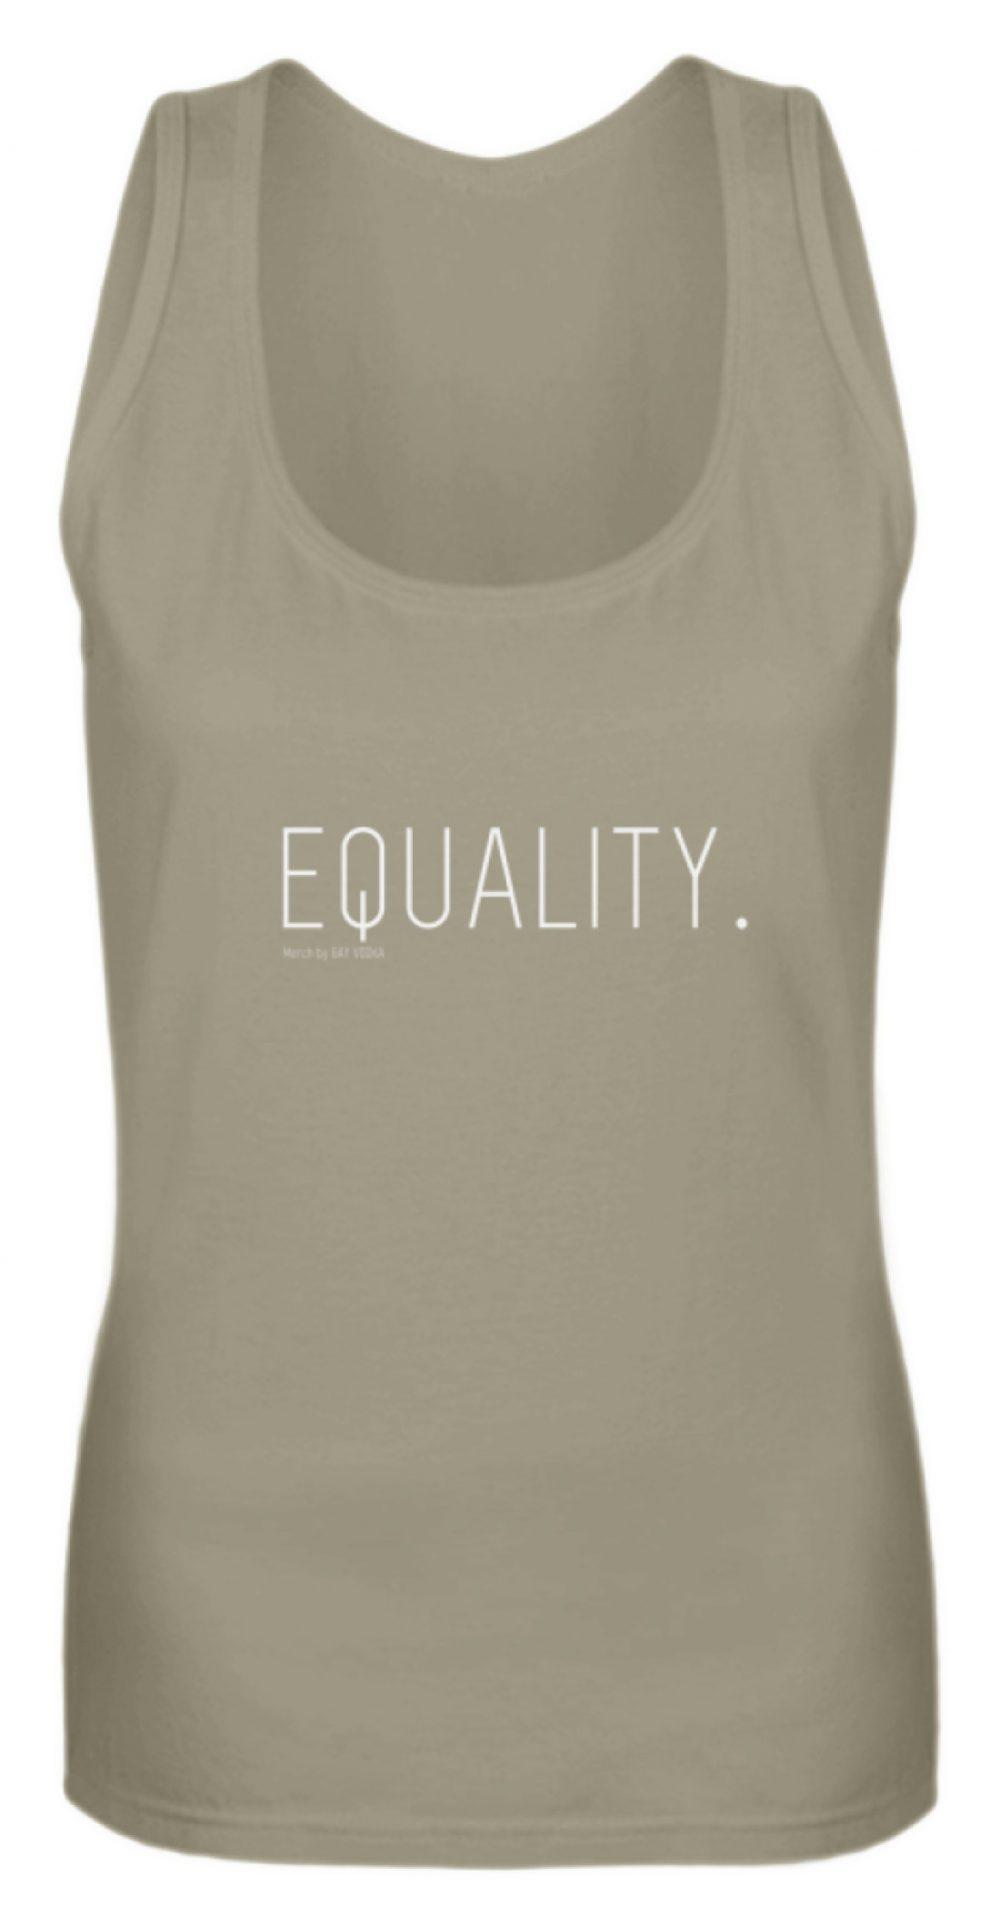 EQUALITY. - Frauen Tanktop-651